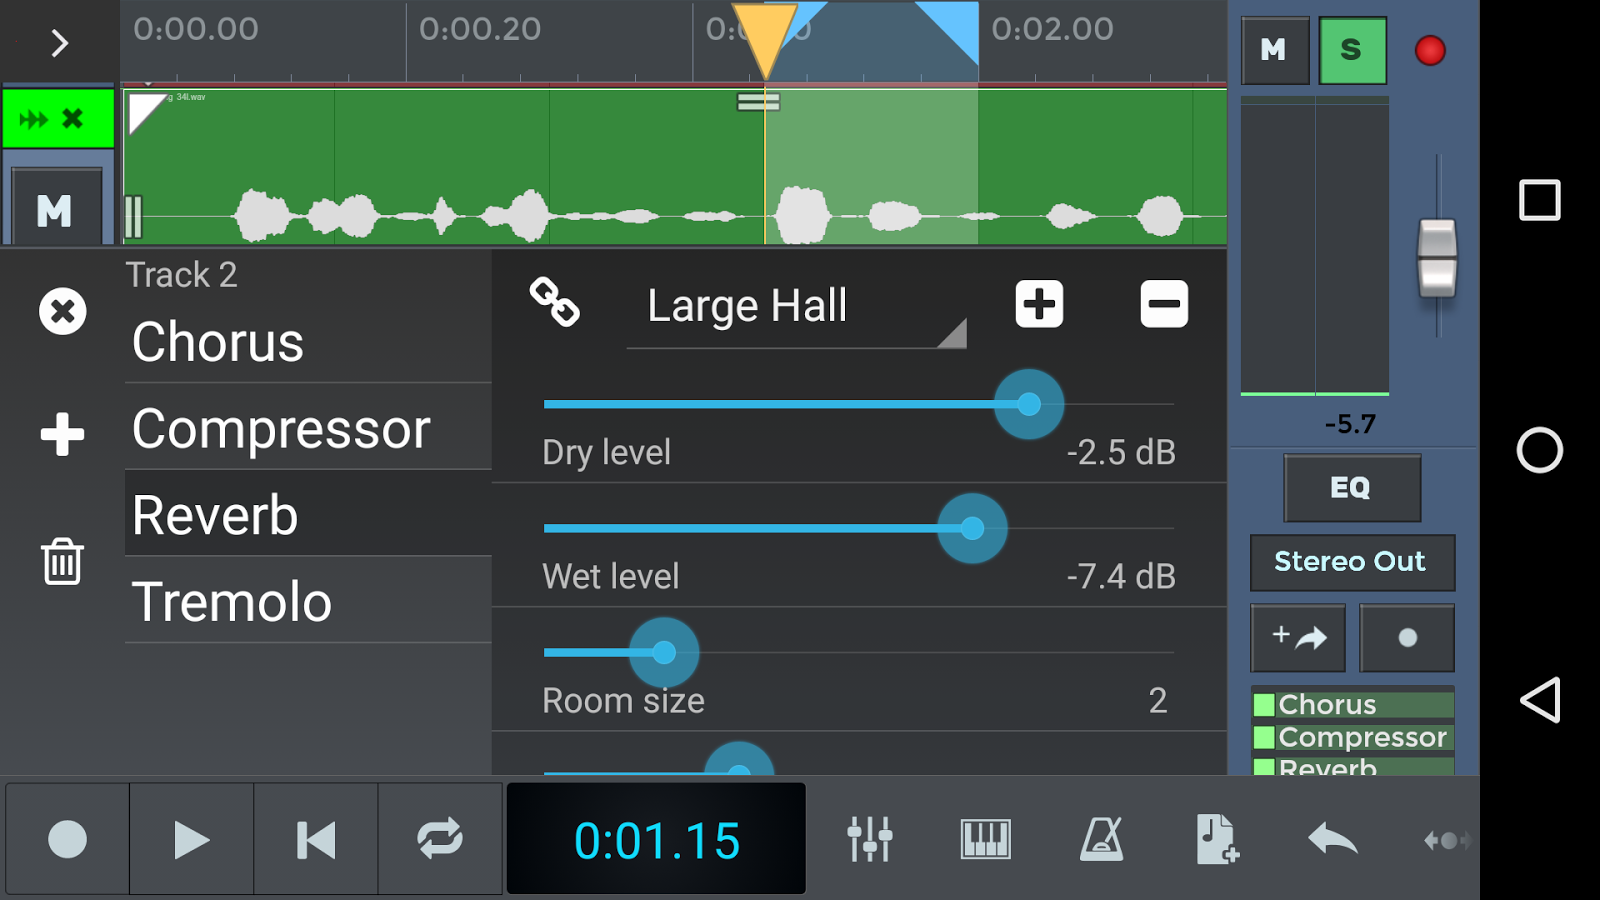 fl studio android latest version free download